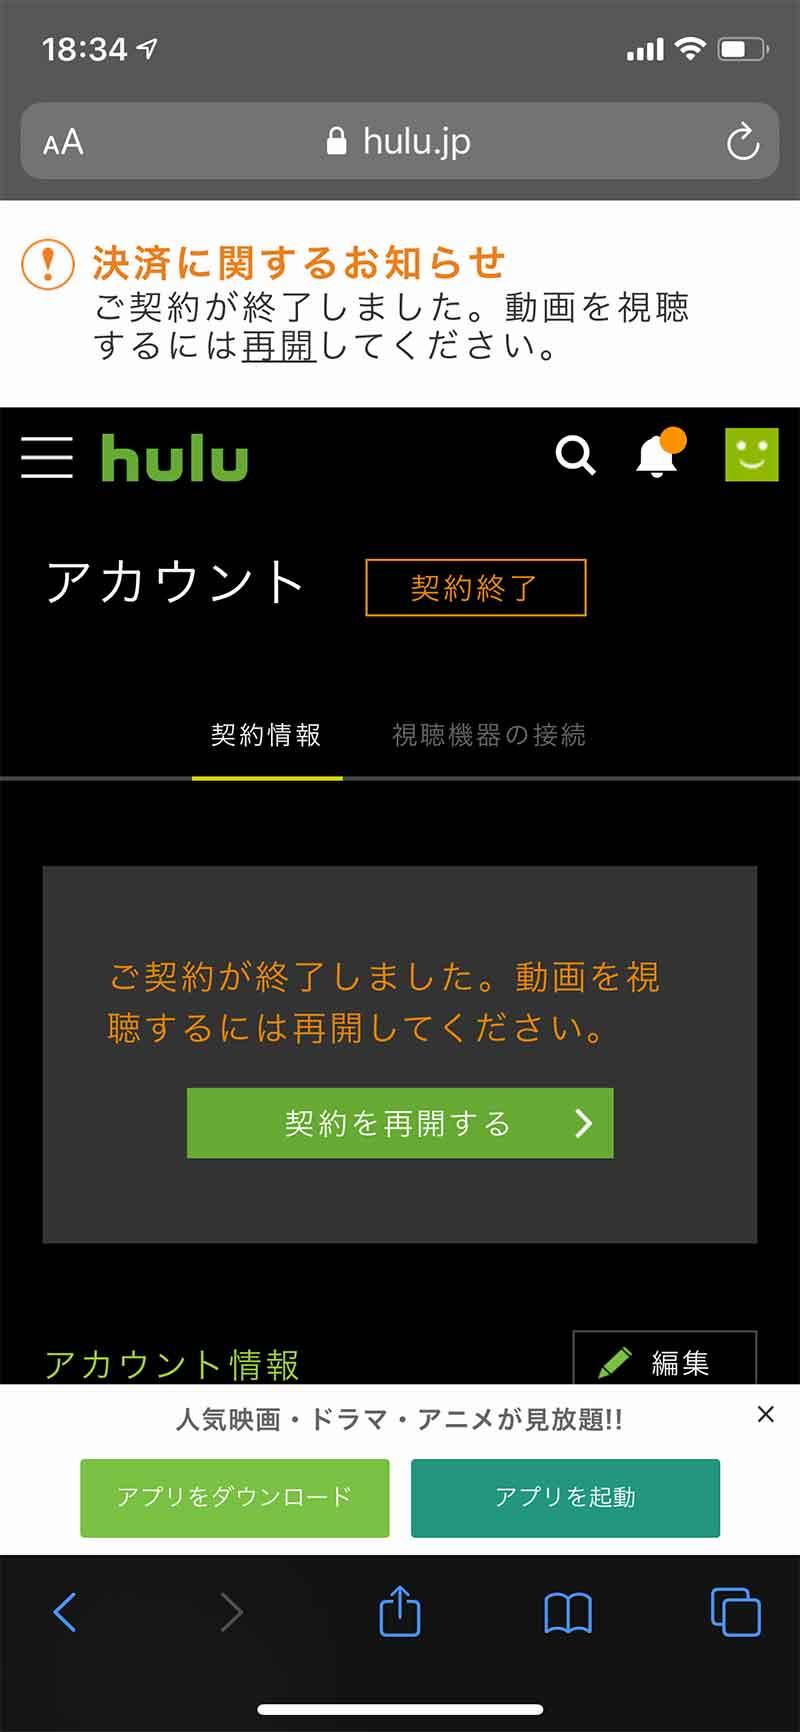 Huluの解約画面